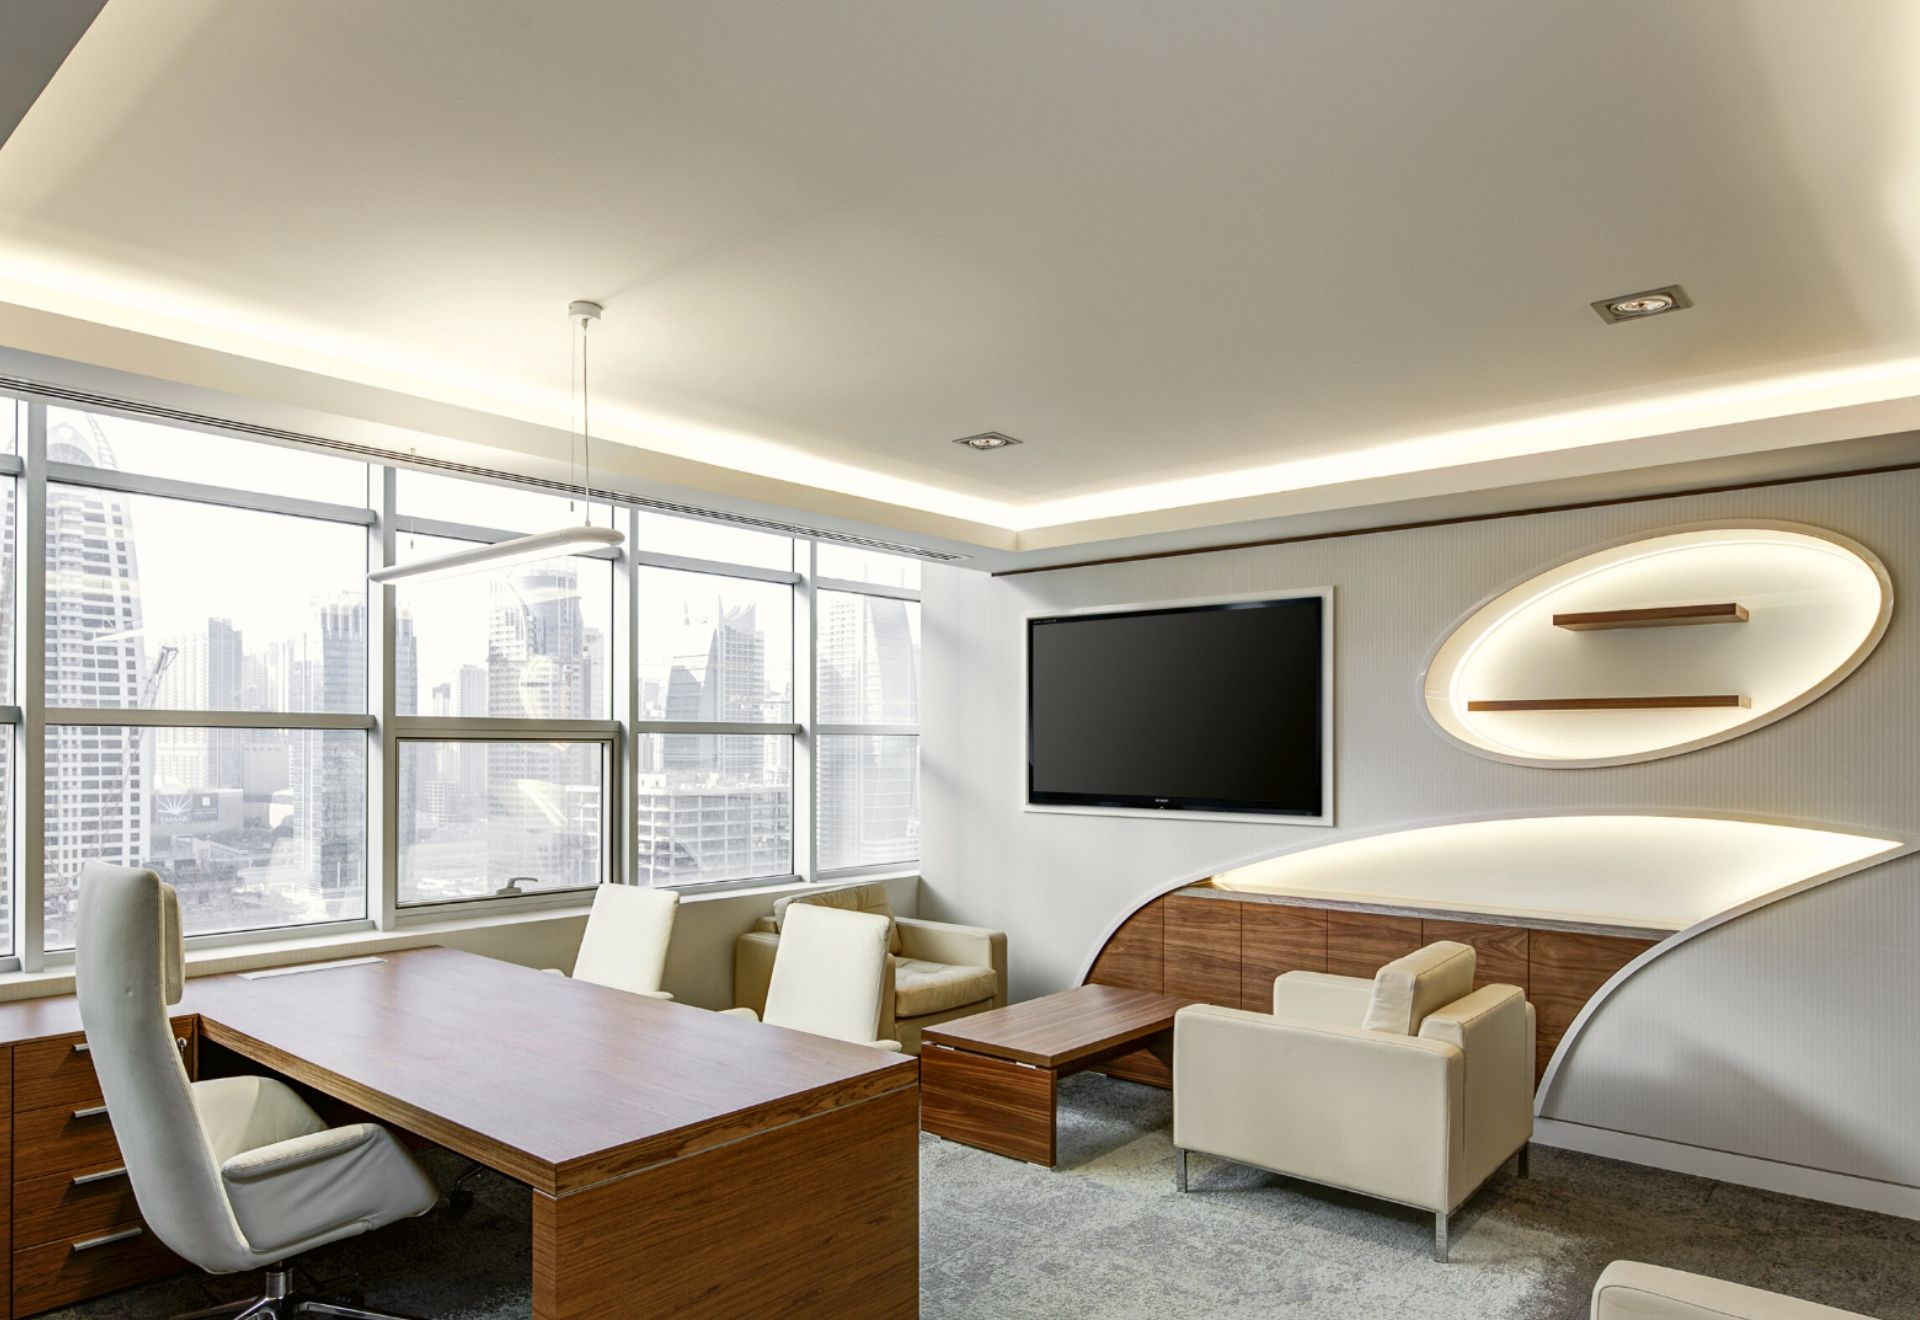 commercial-interior-designers-ziatoninnovative